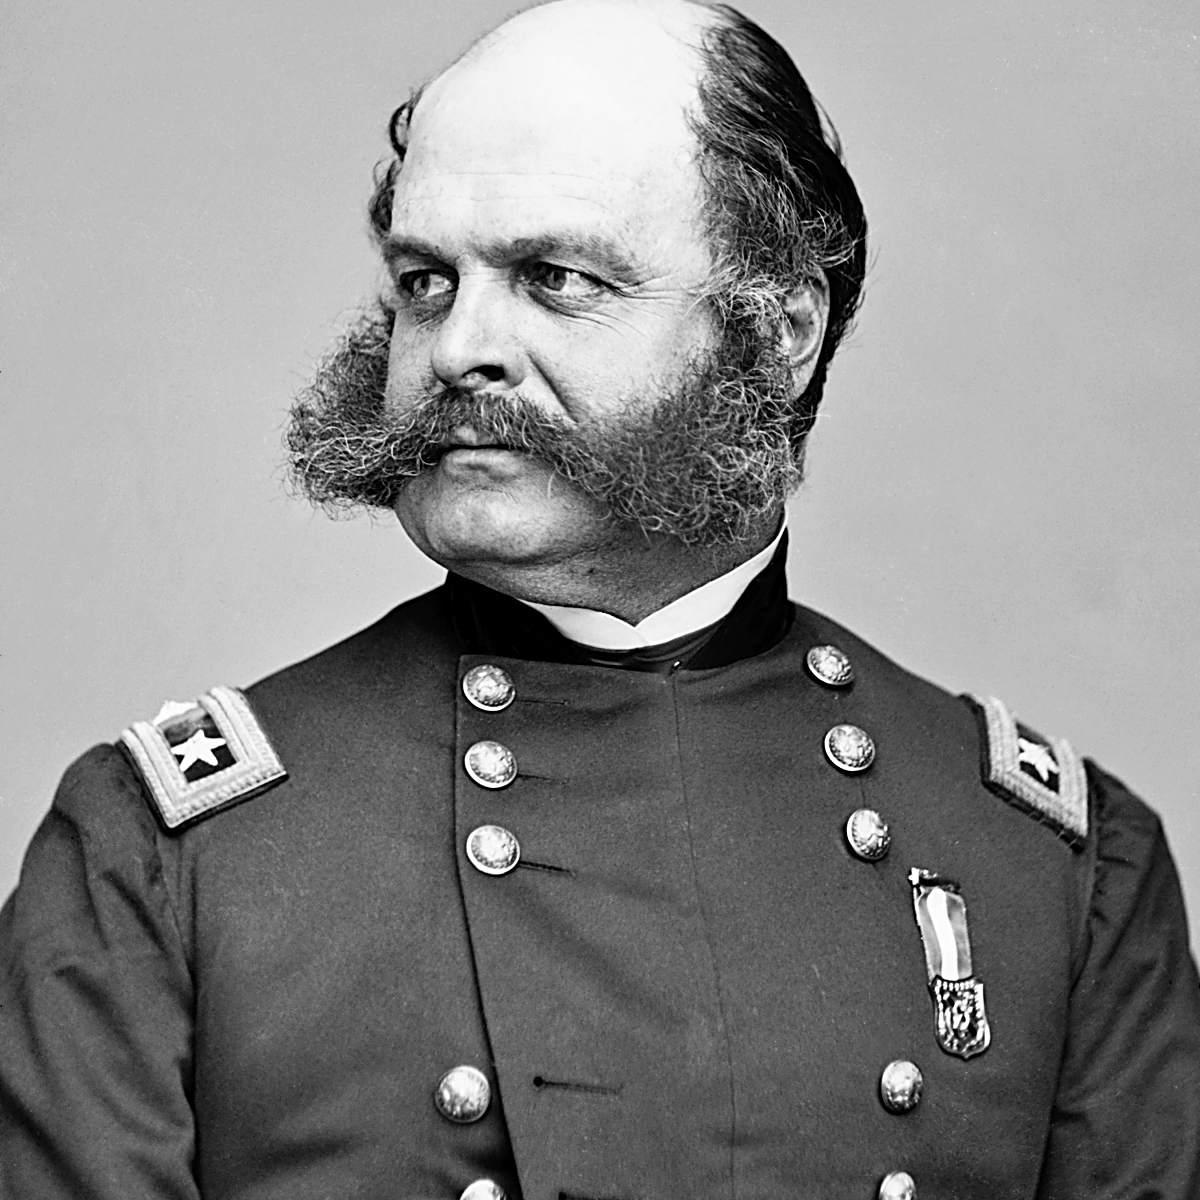 Portrait of Ambrose Burnside